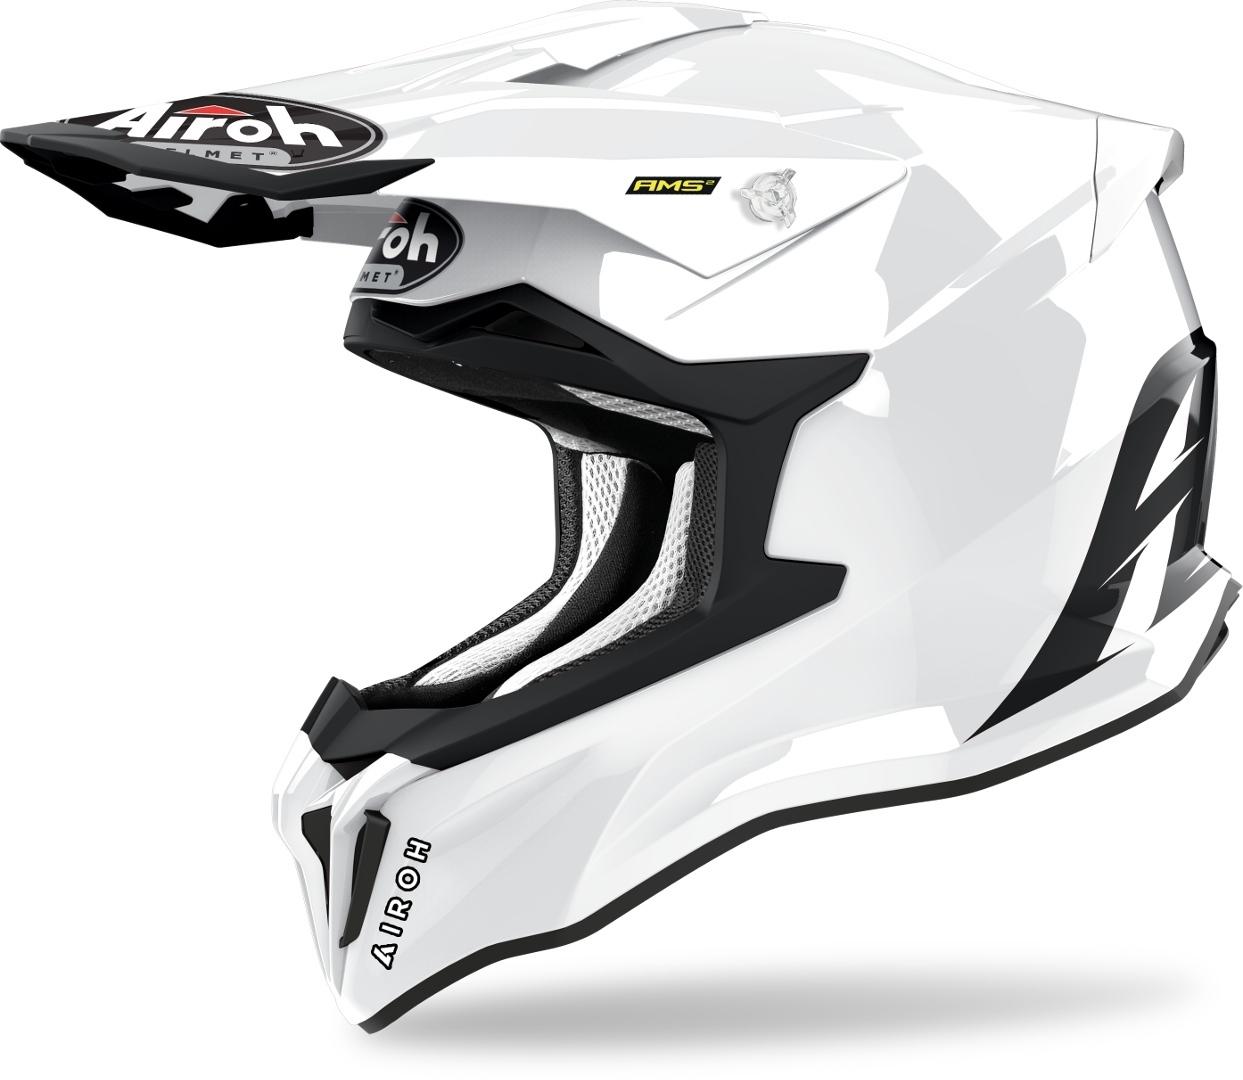 Airoh Strycker Color Carbon Motocross Helm, weiss, Größe M, weiss, Größe M